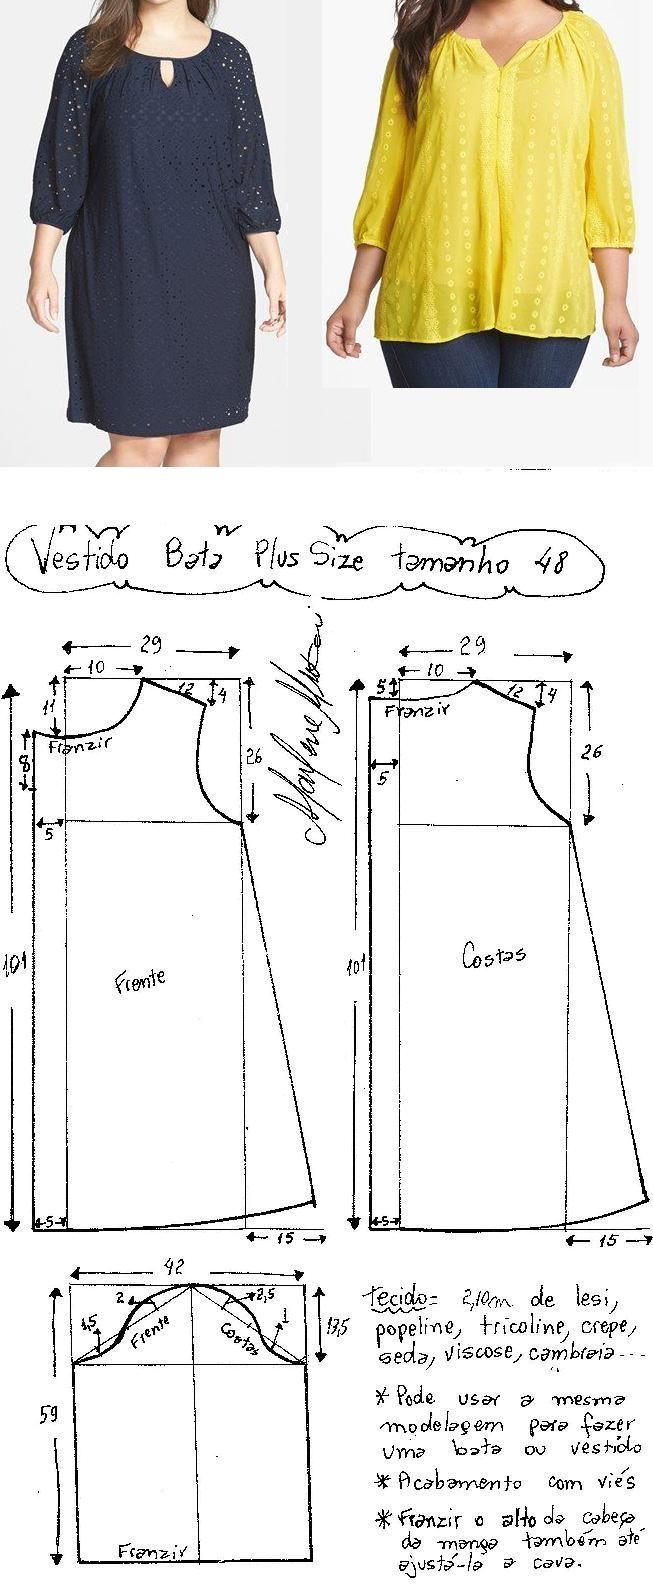 Vestido tipo bata plus size | Sewing Patterns | Pinterest